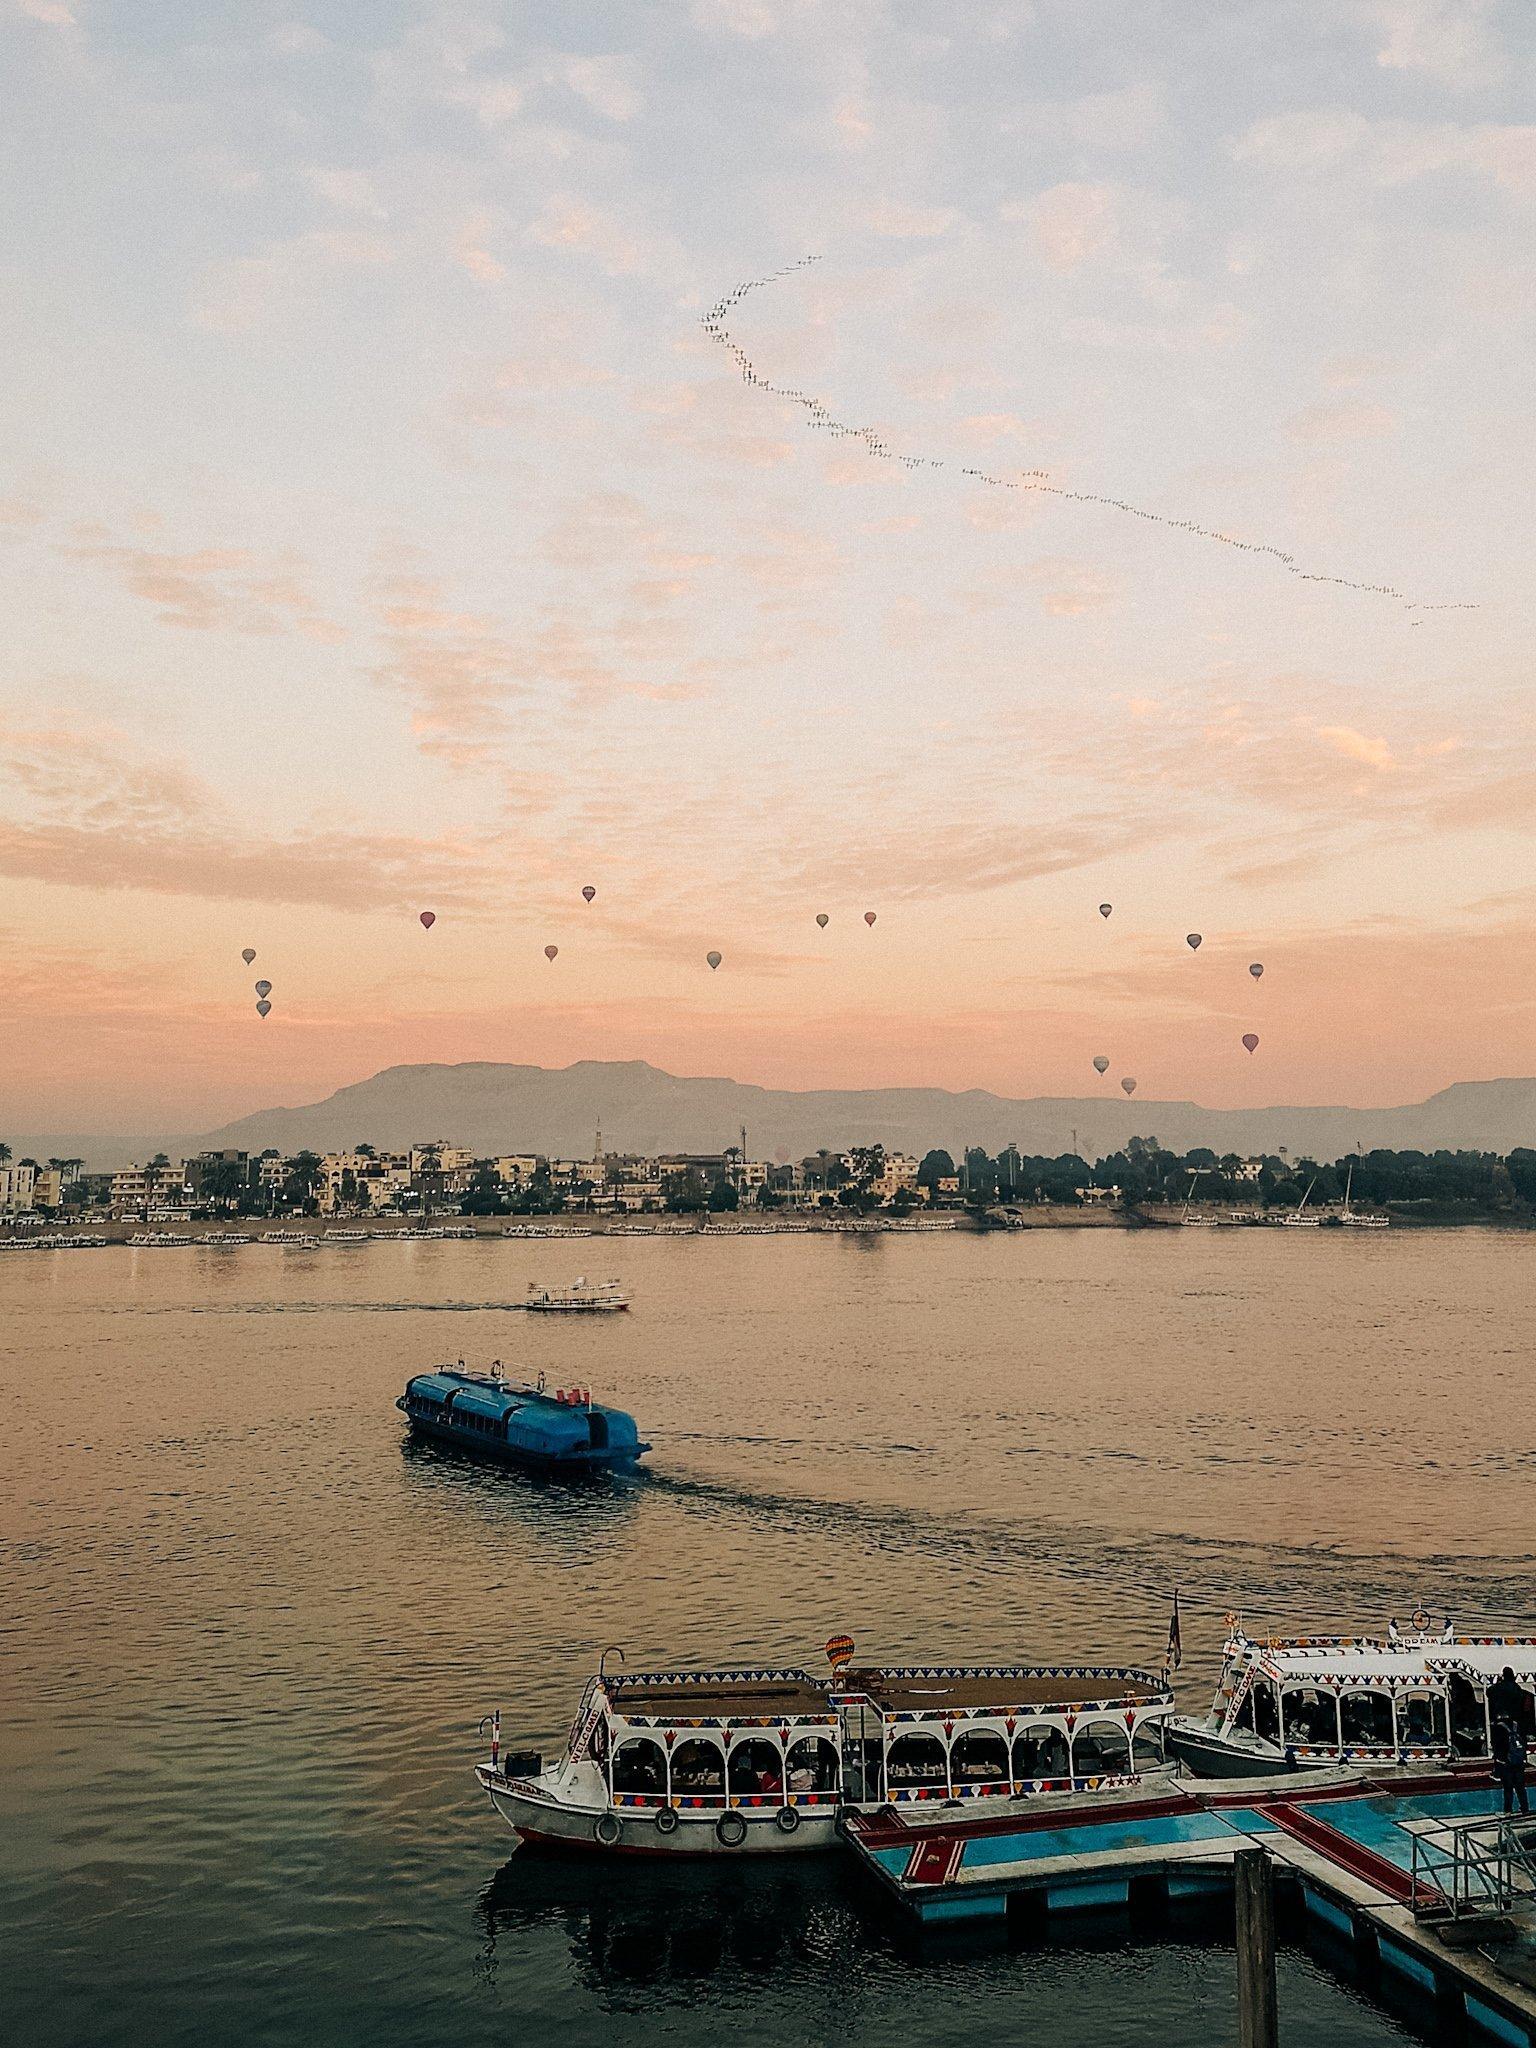 Hot Air Balloons Luxor